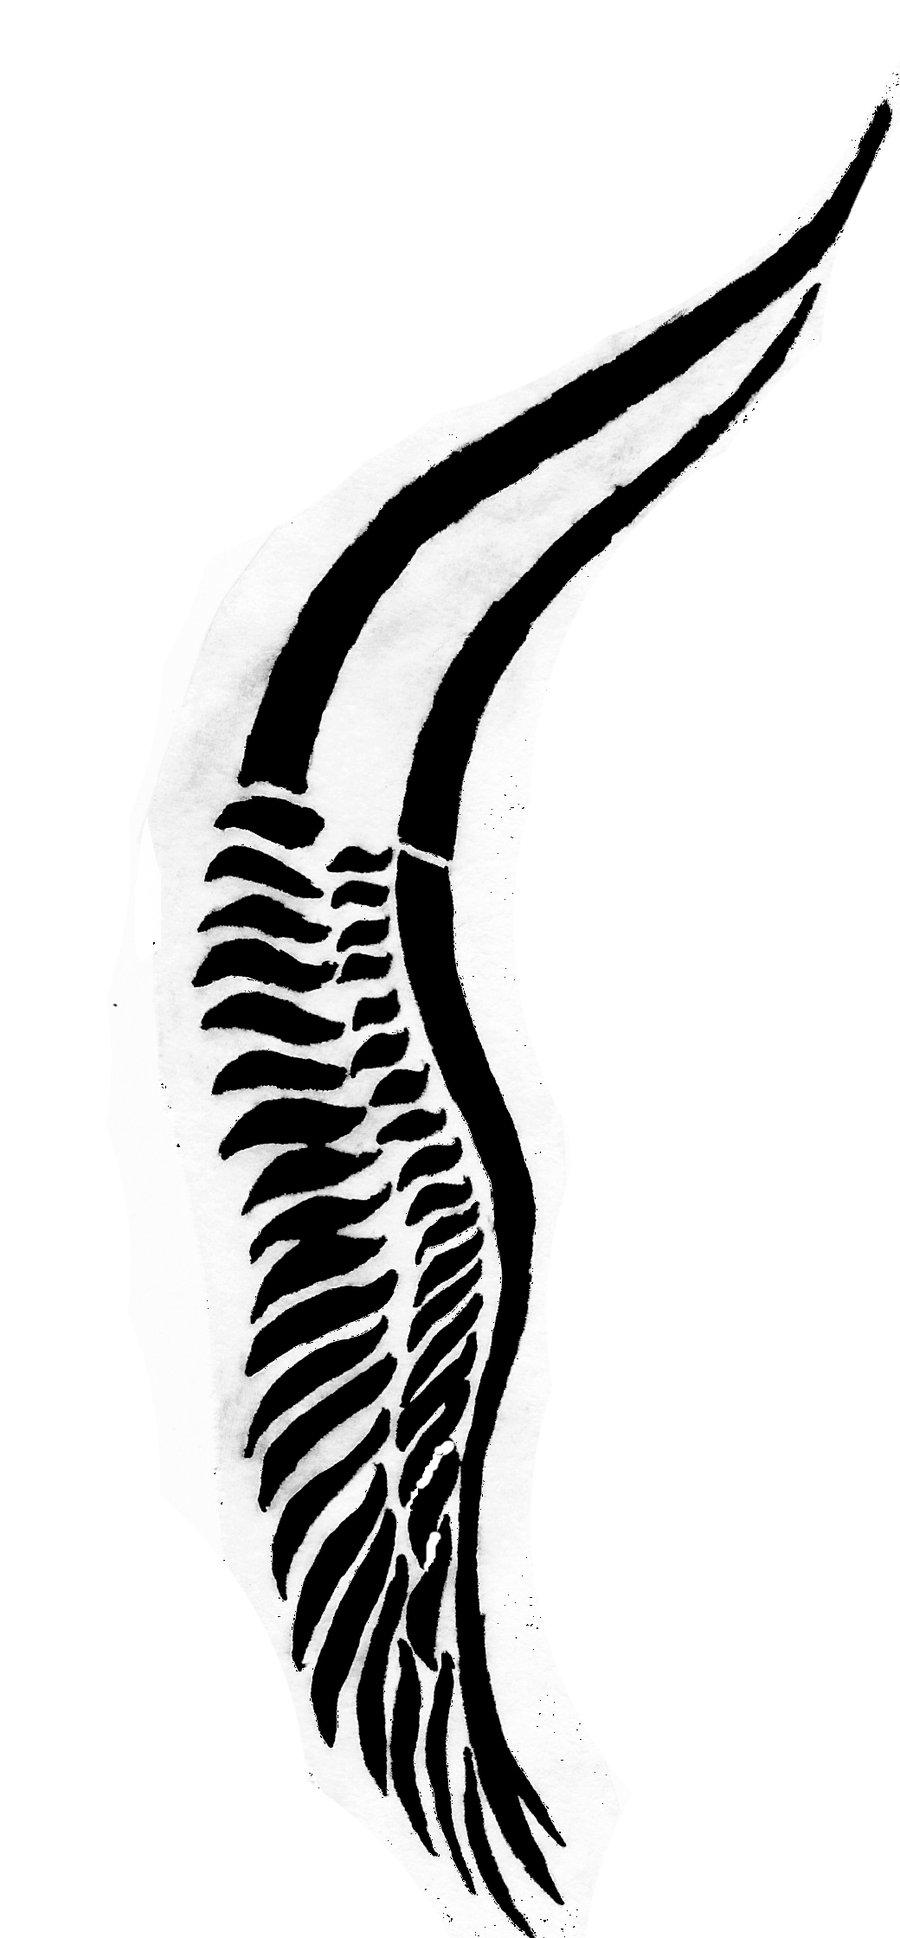 Valkyrie Tattoo Ideas By Shadow